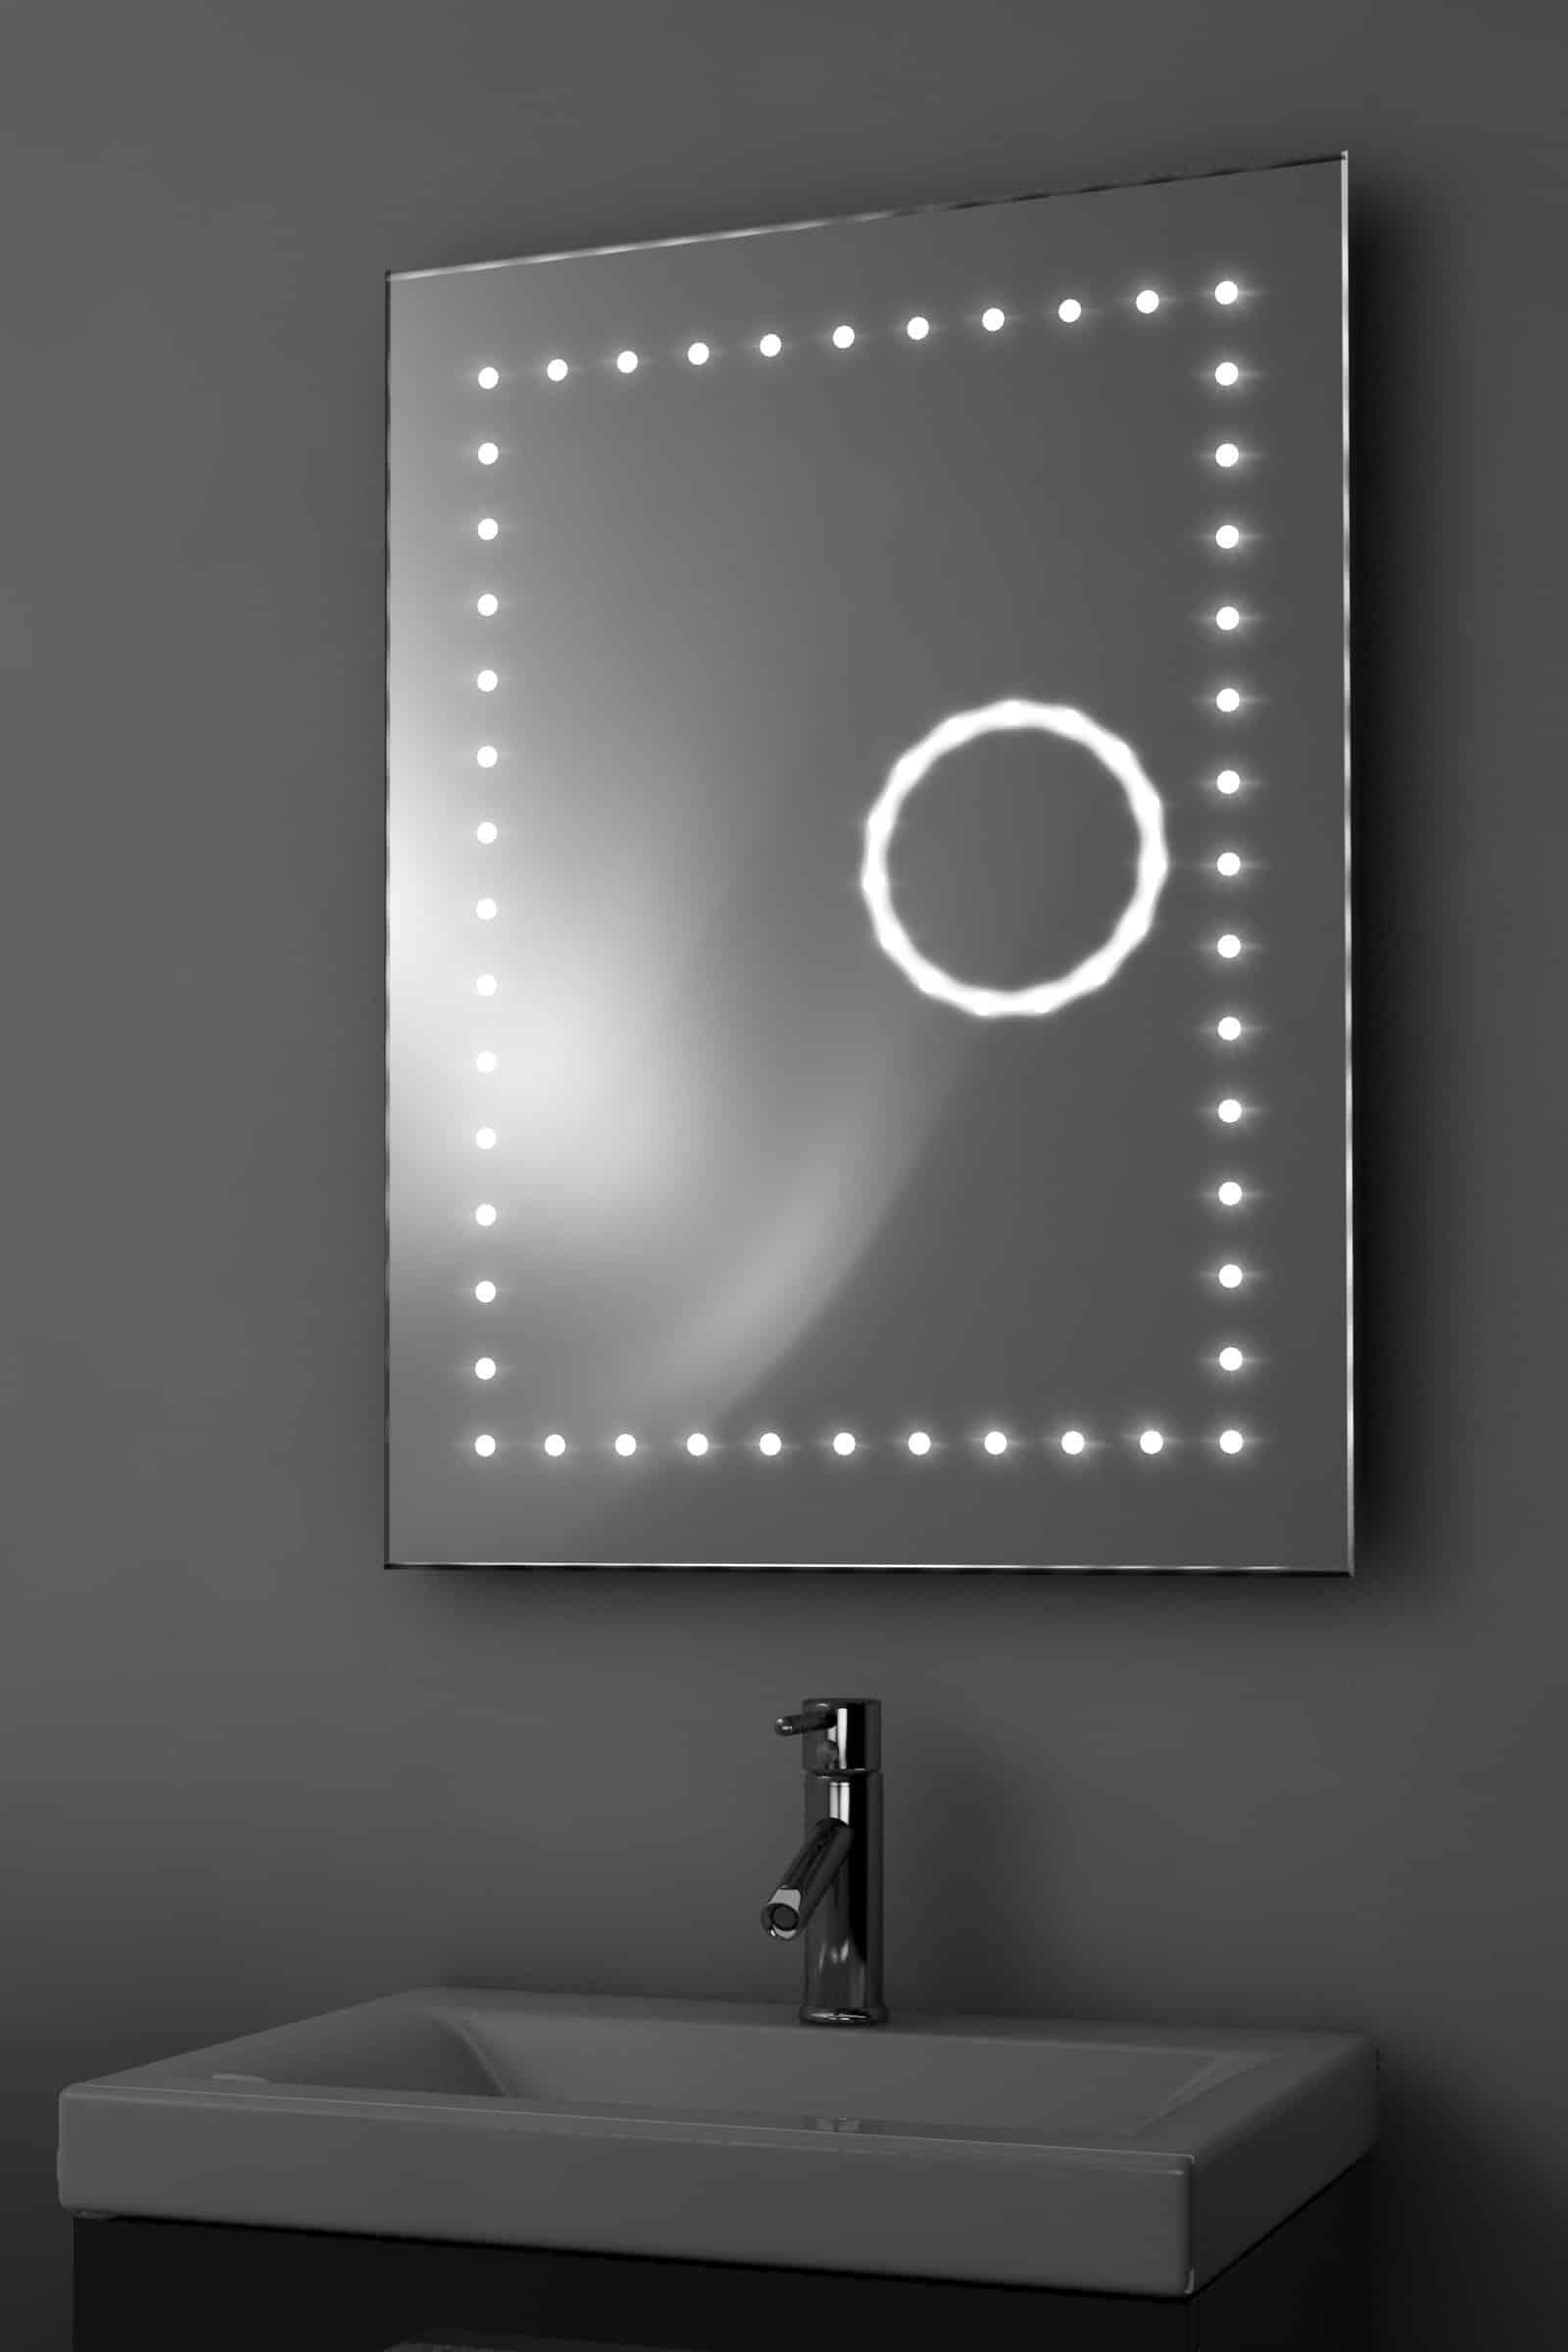 LED spiegel met vergrotingsspiegel en verwarming 60x80 cm ...